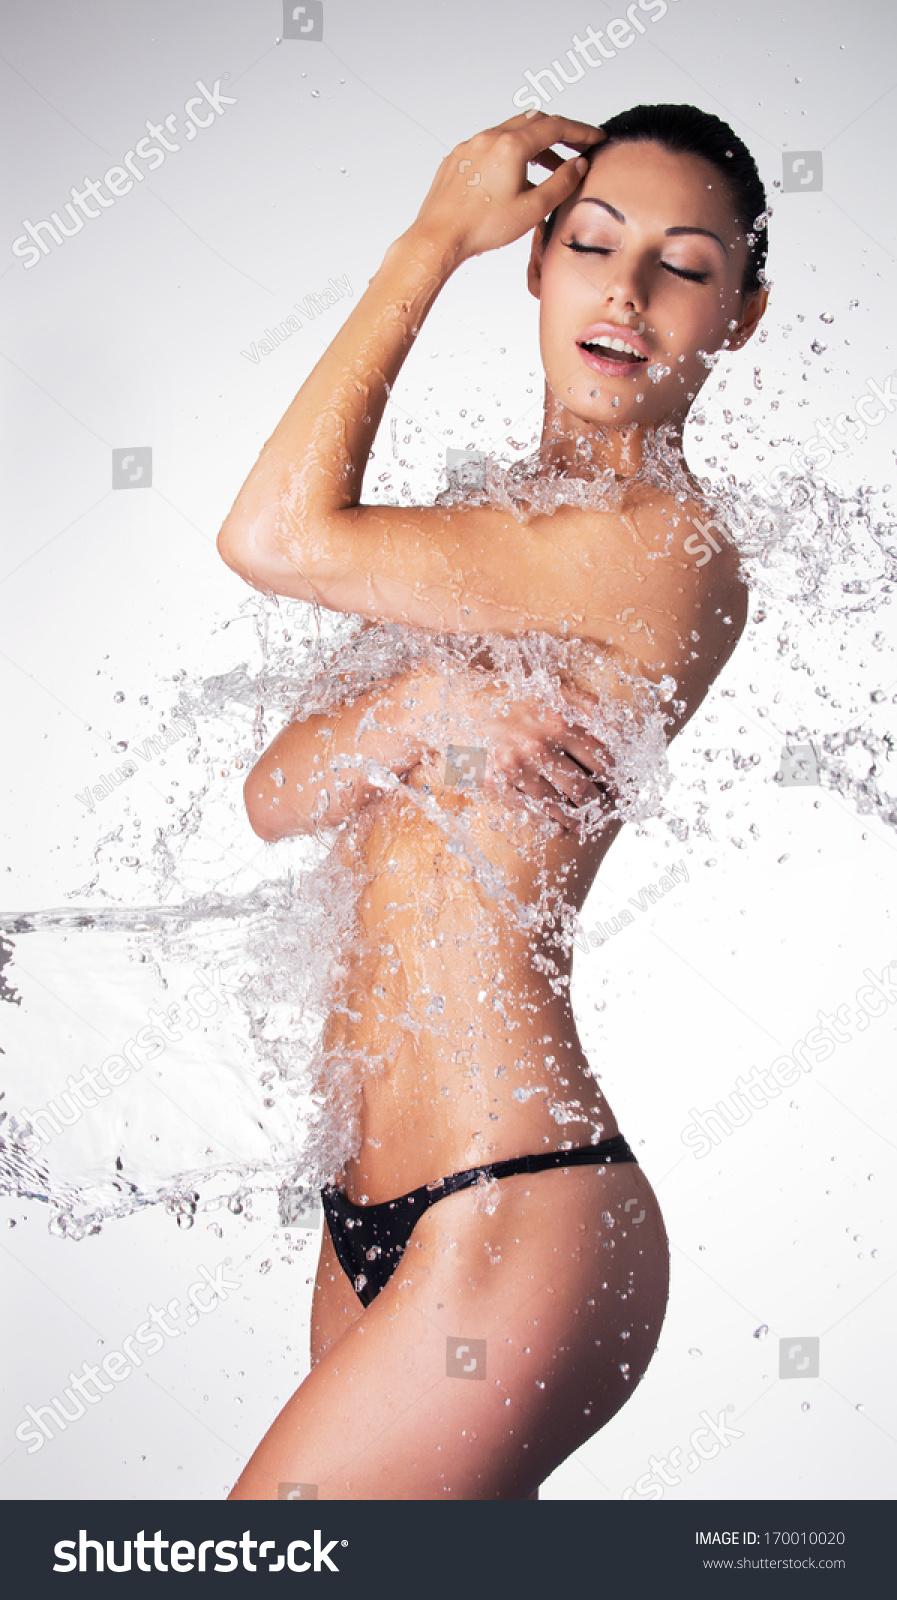 Sex having naked models blonde